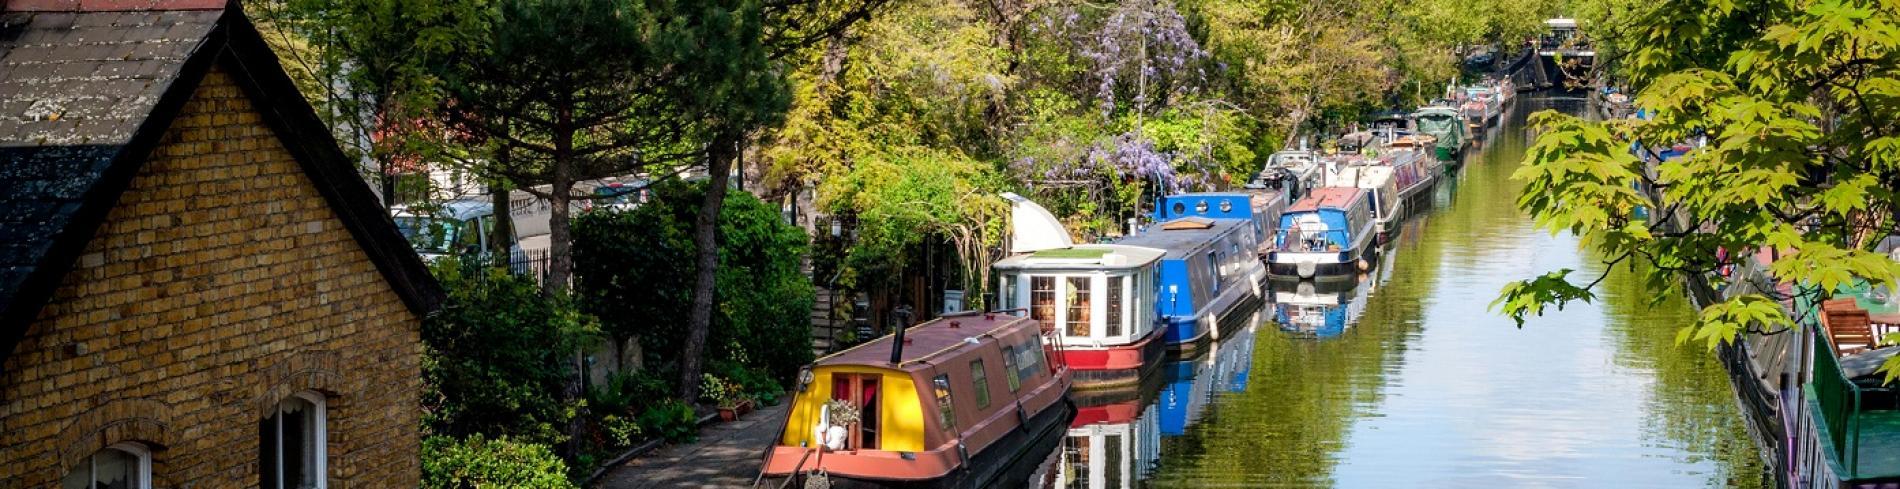 Regents Canal river boats